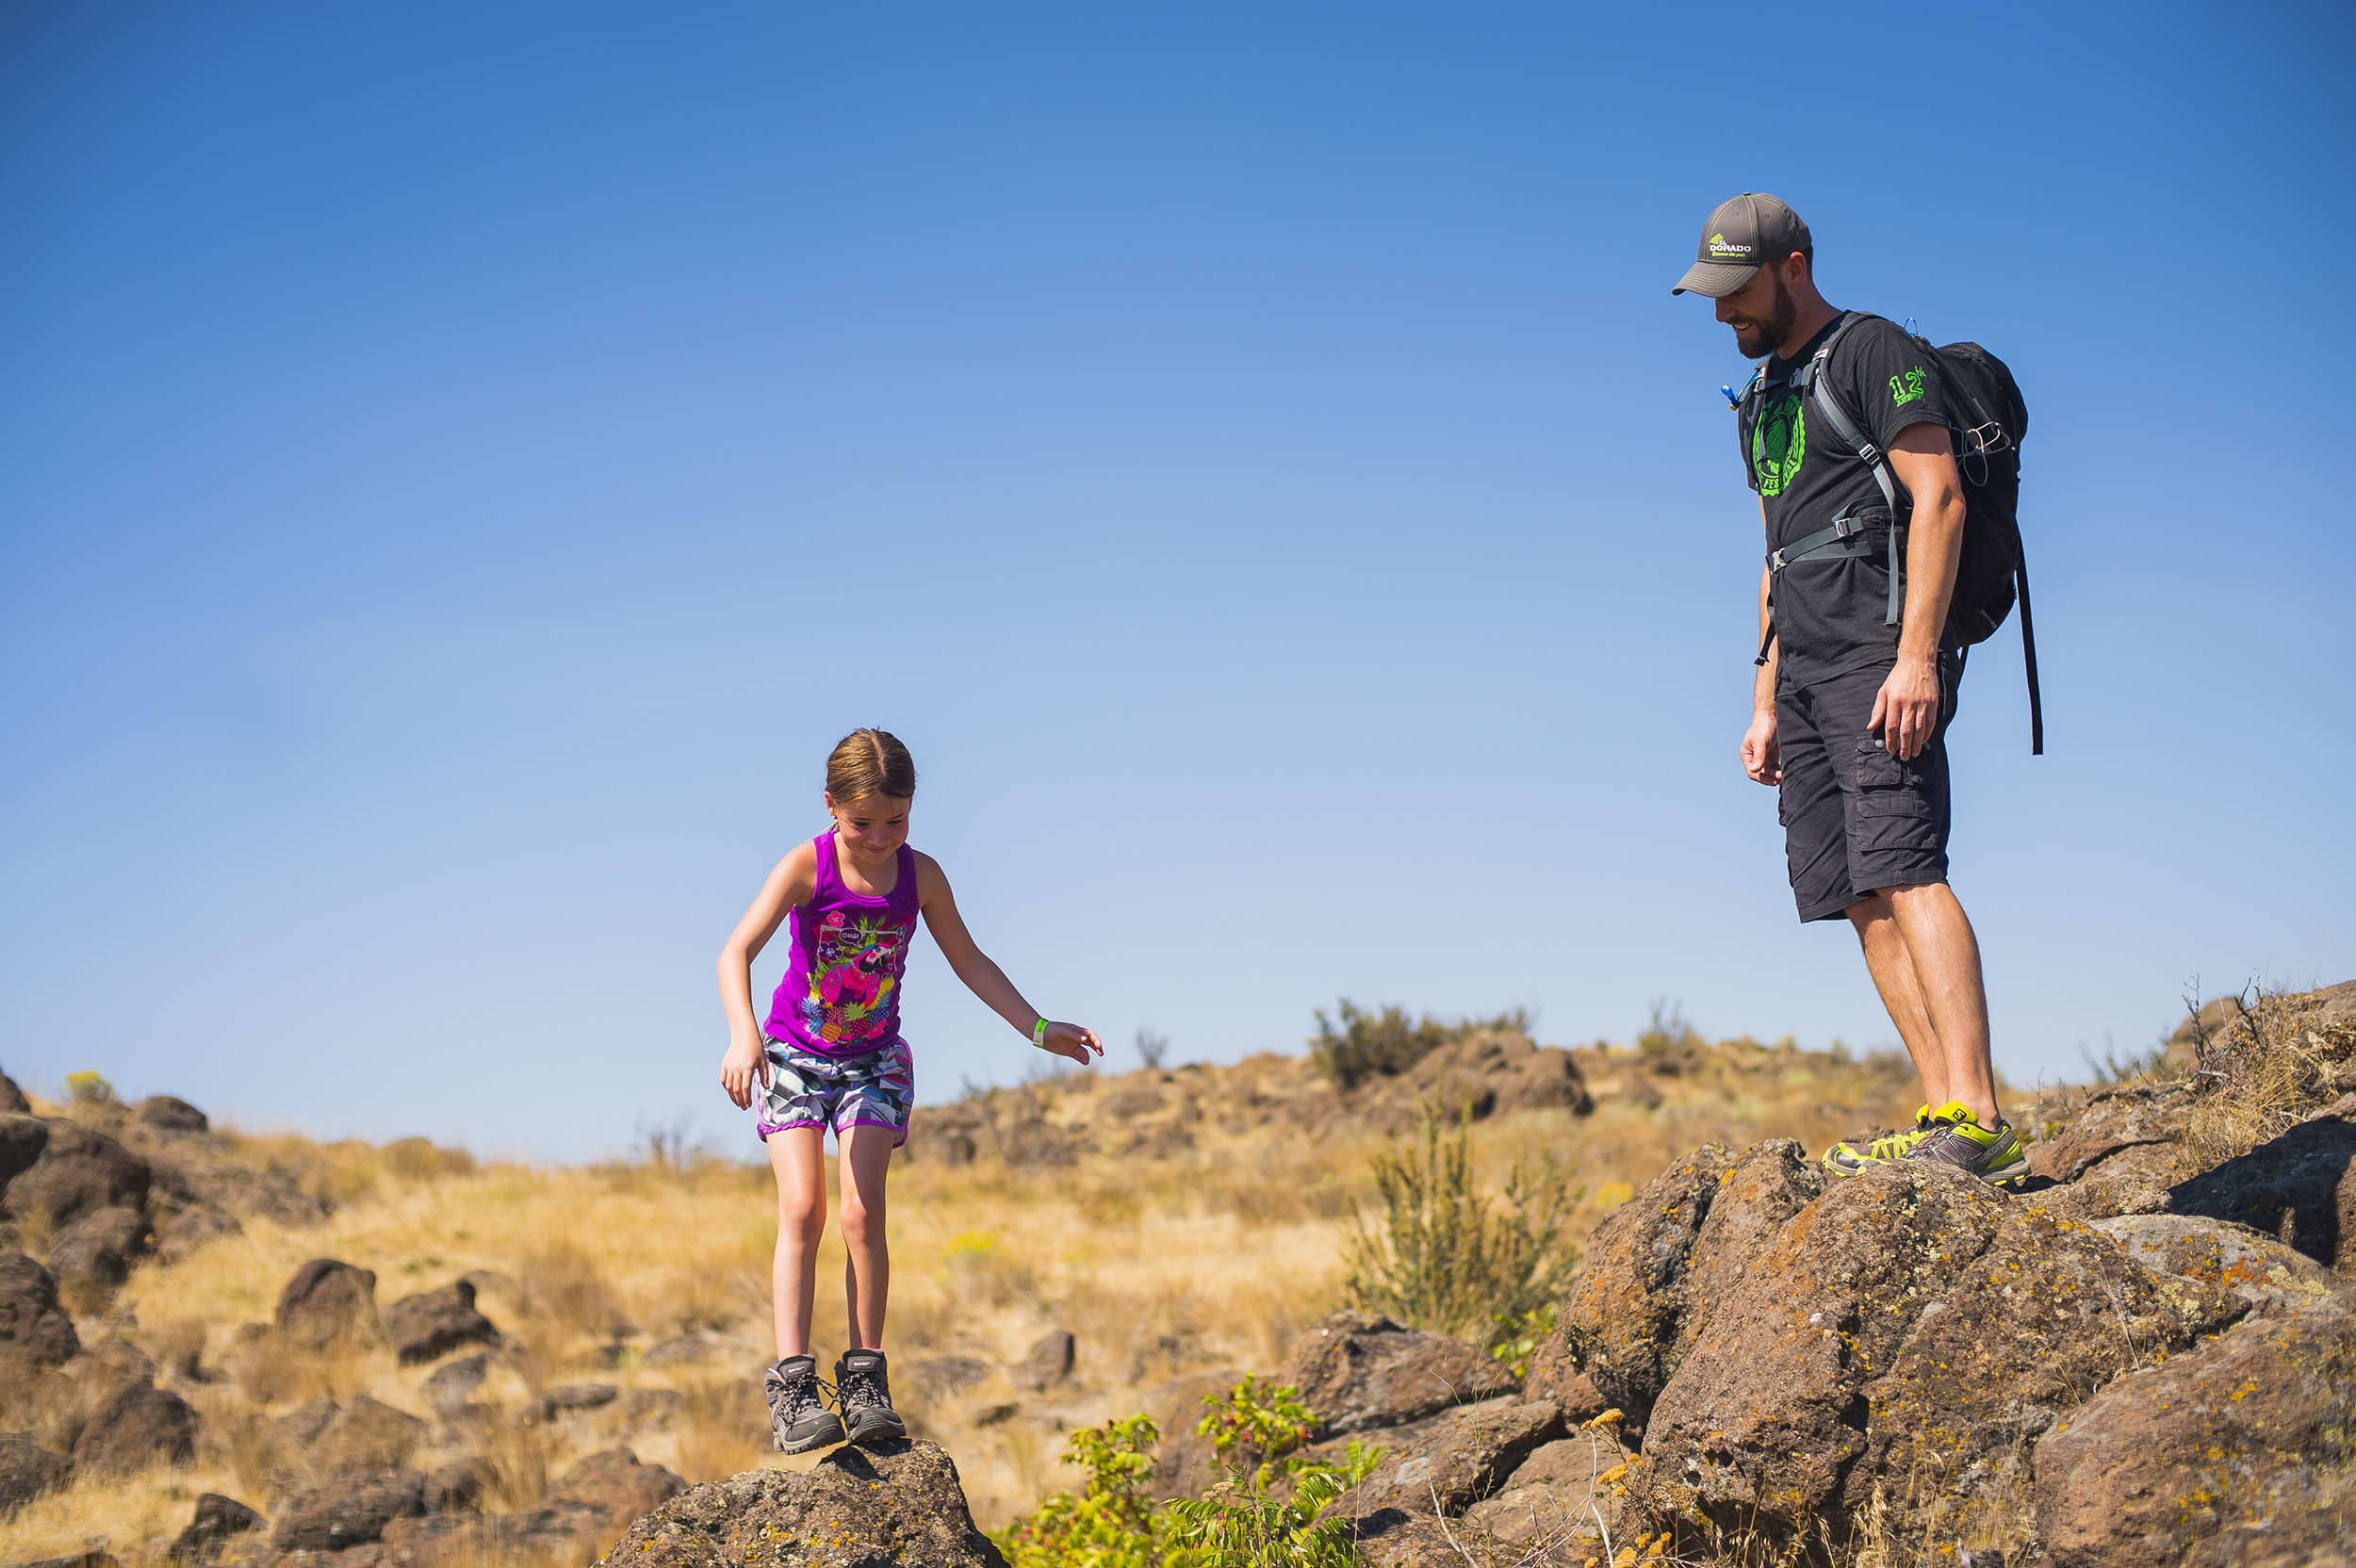 Cowiche Canyon Trail - Yakima, WA